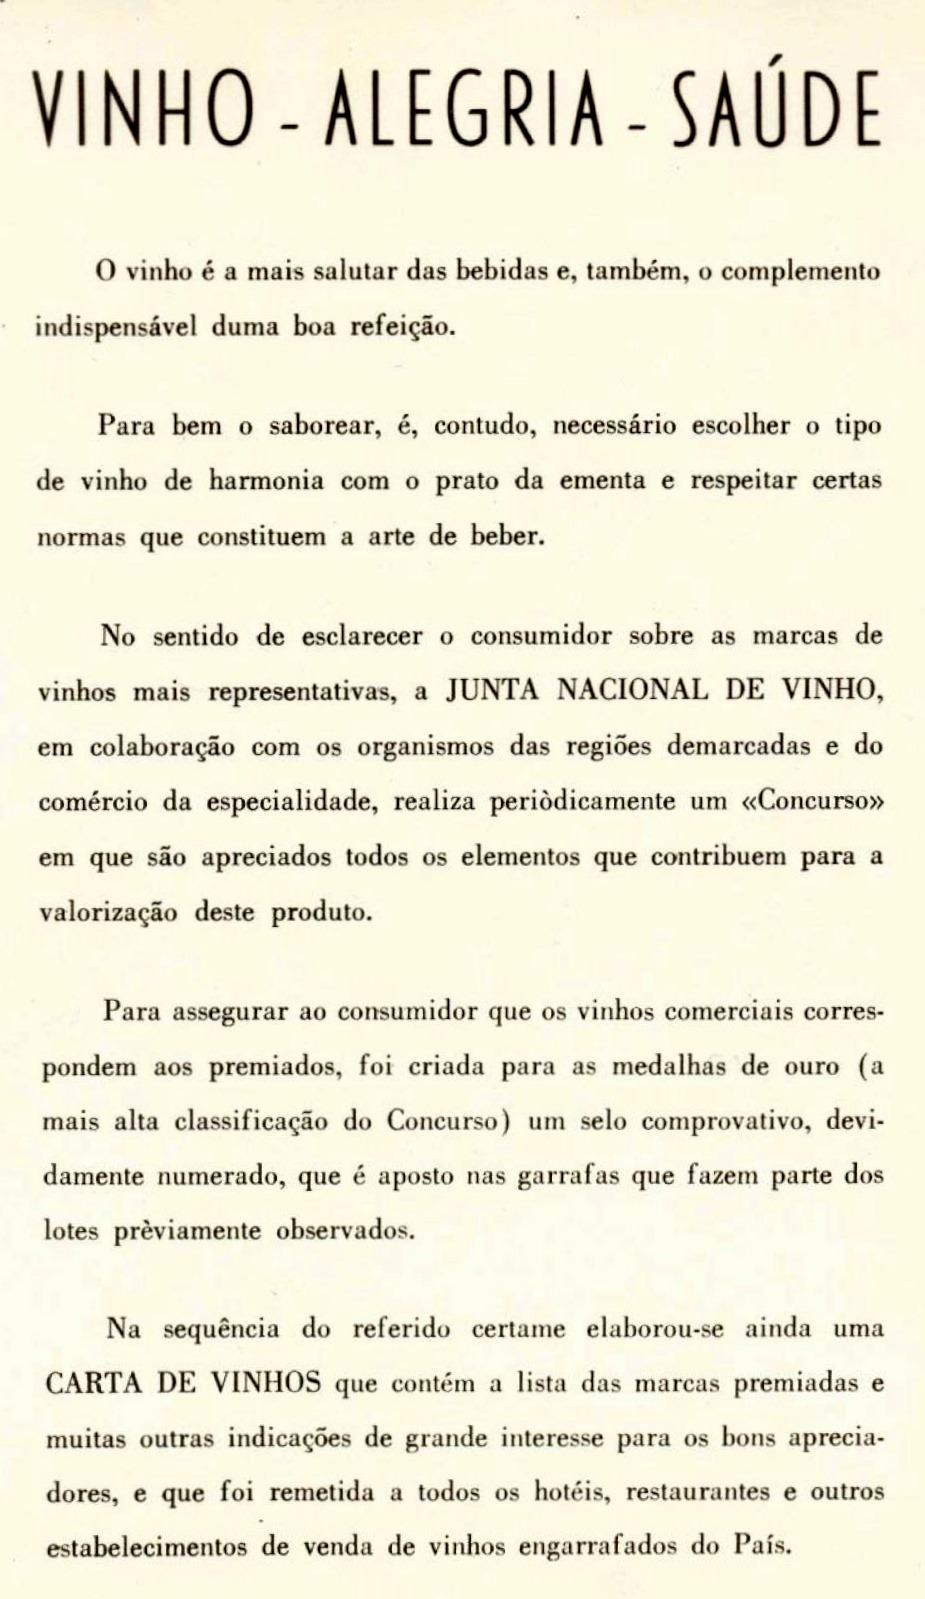 [JNV.311]